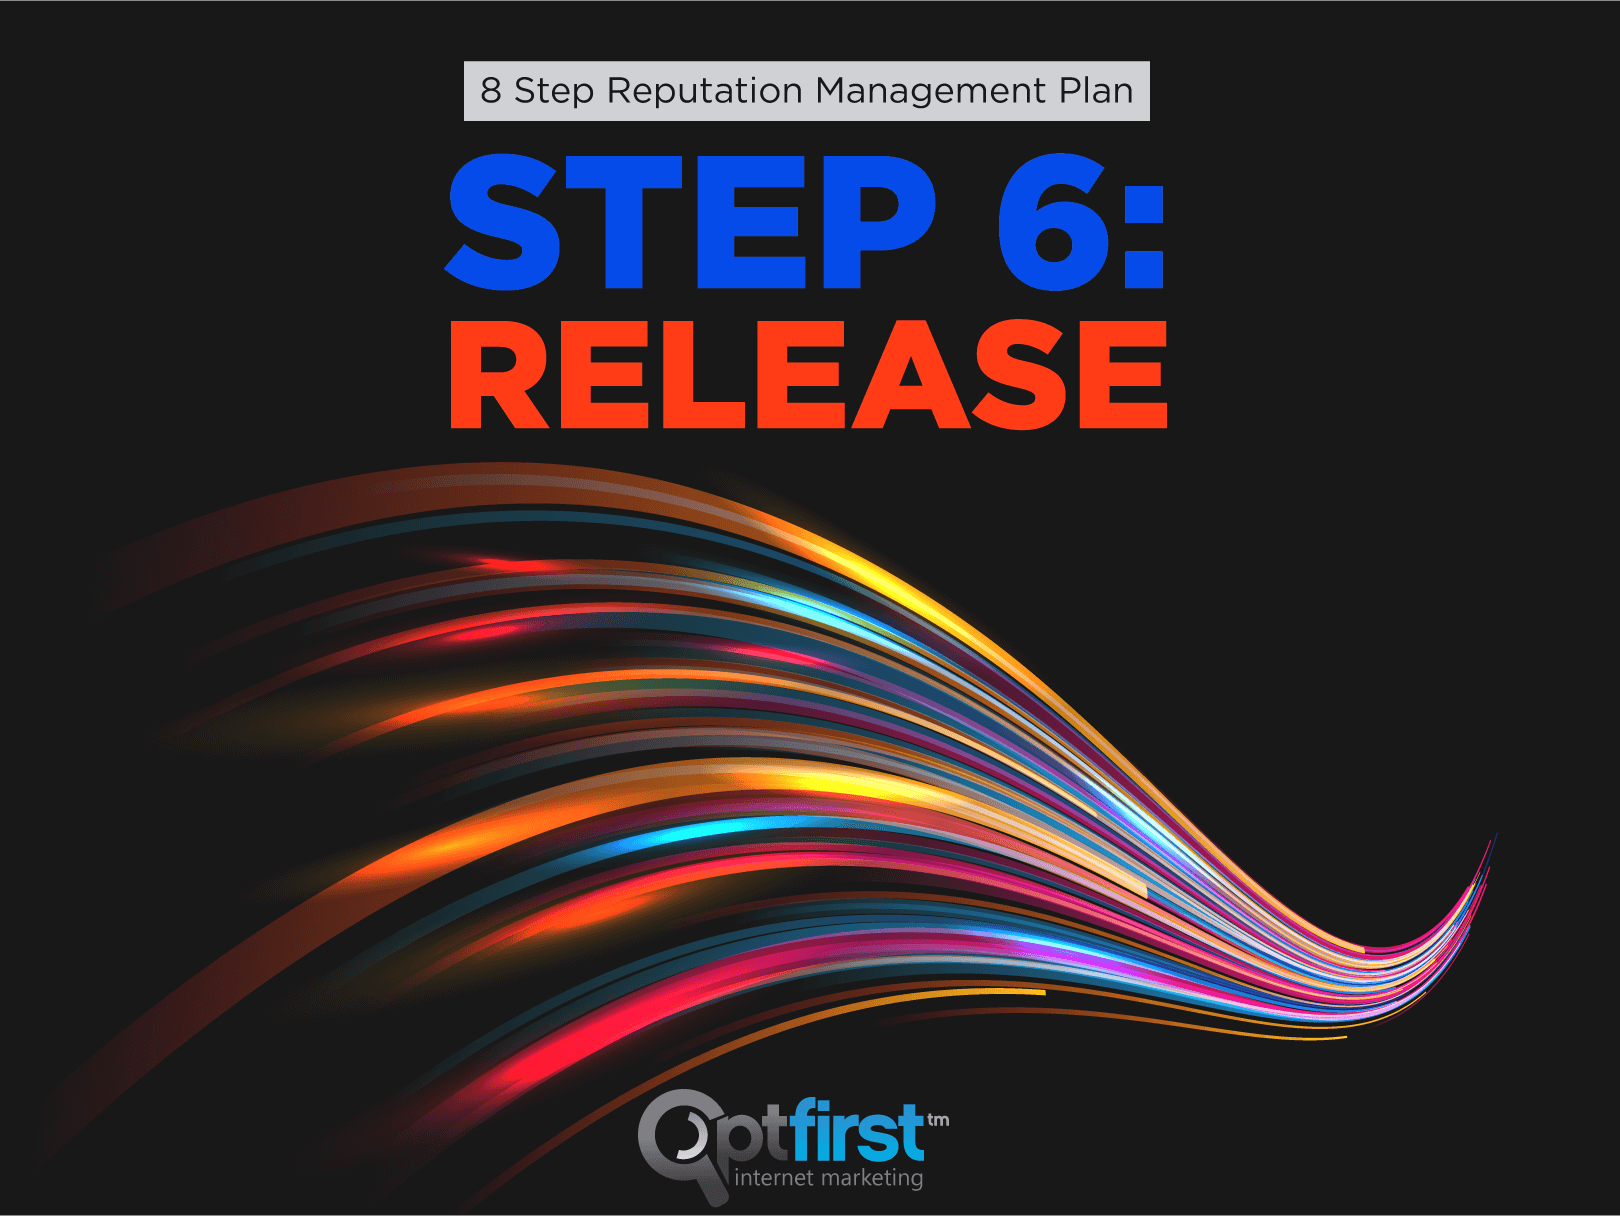 8 Step Reputation Management Plan Step 6: Release